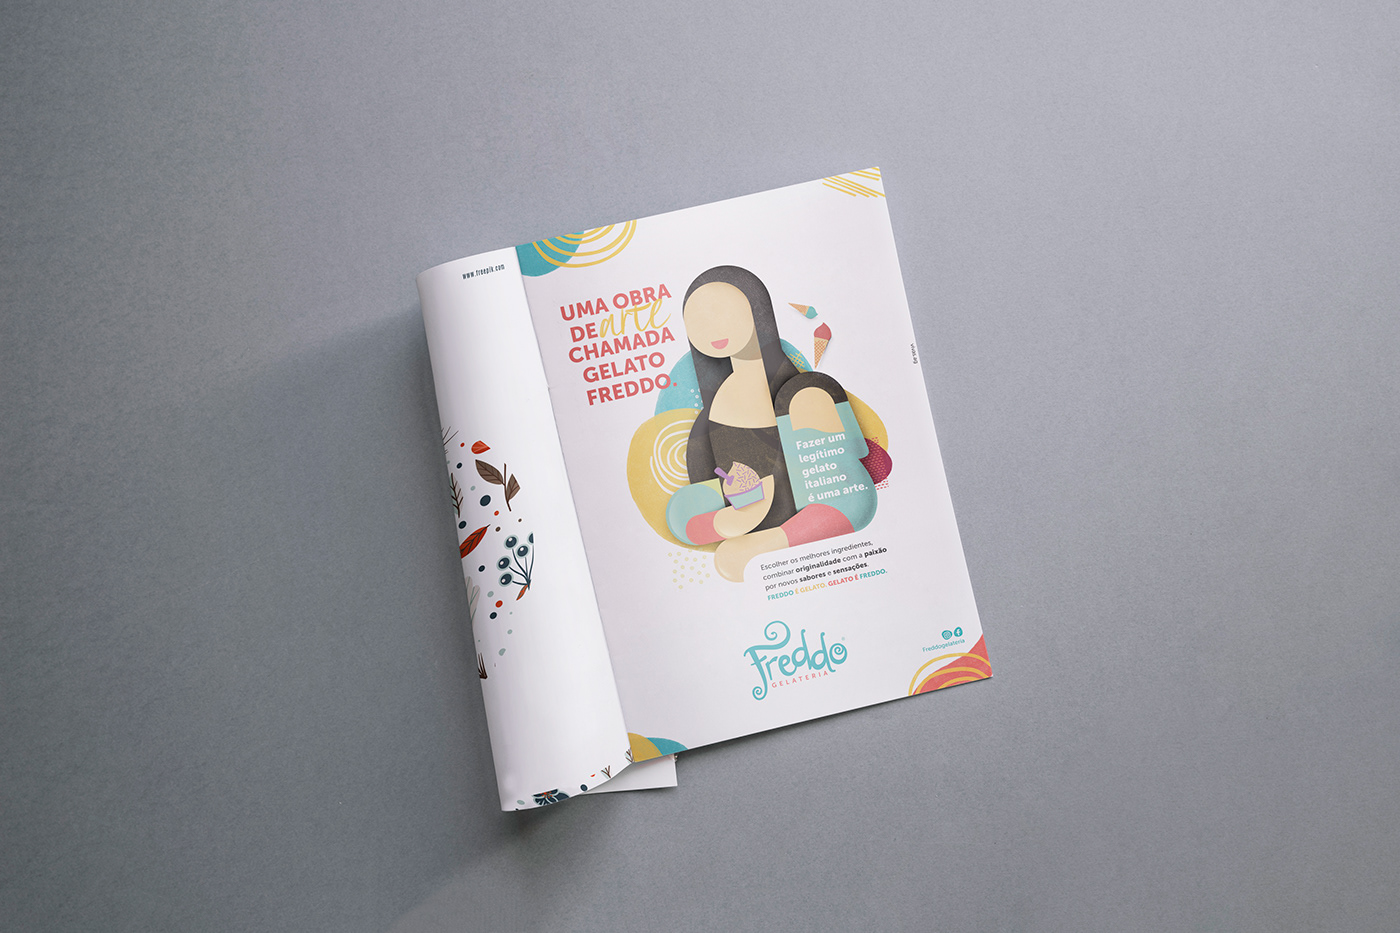 Image may contain: cartoon and book